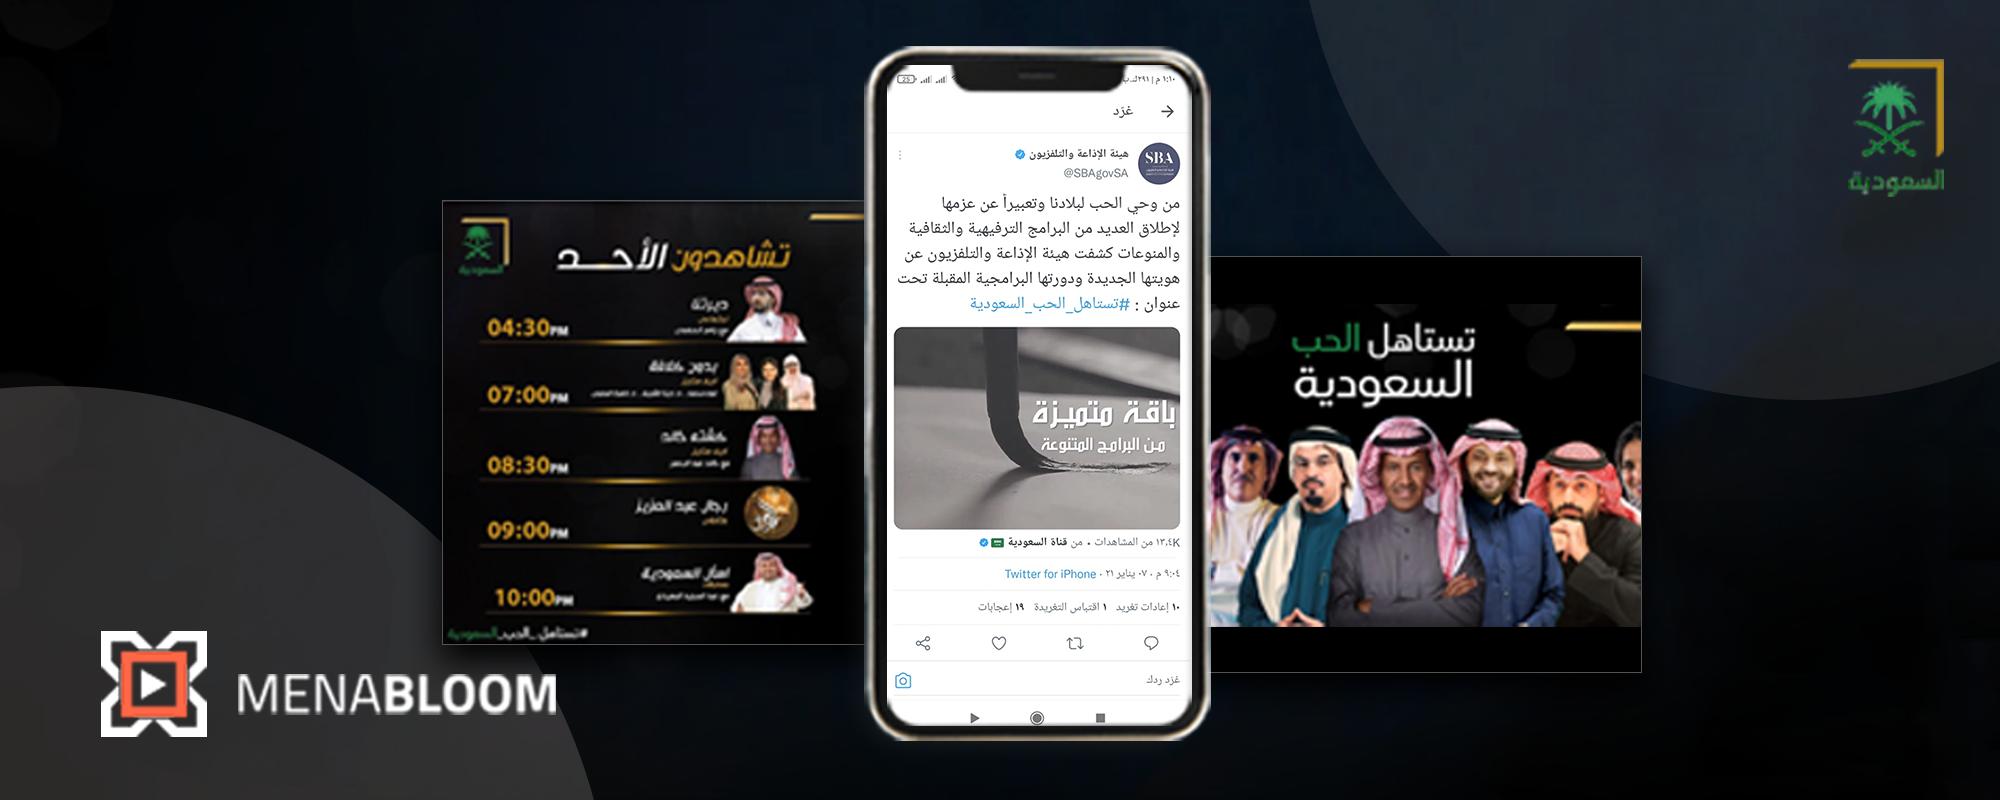 Saudia TV campaign new Grid